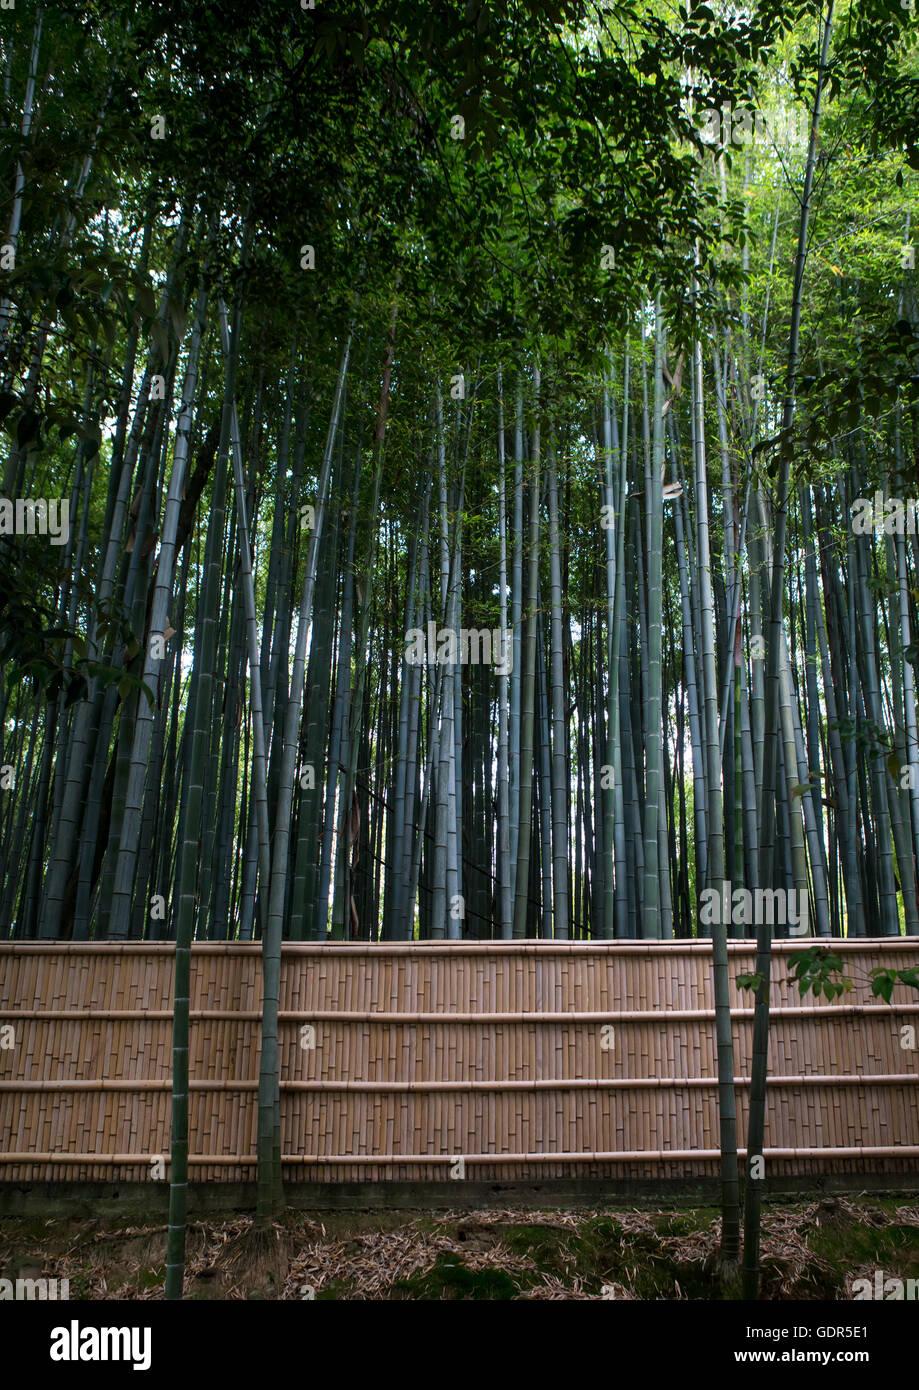 Bamboos in in koto-in zen buddhist temple in daitoku-ji, Kansai region, Kyoto, Japan - Stock Image